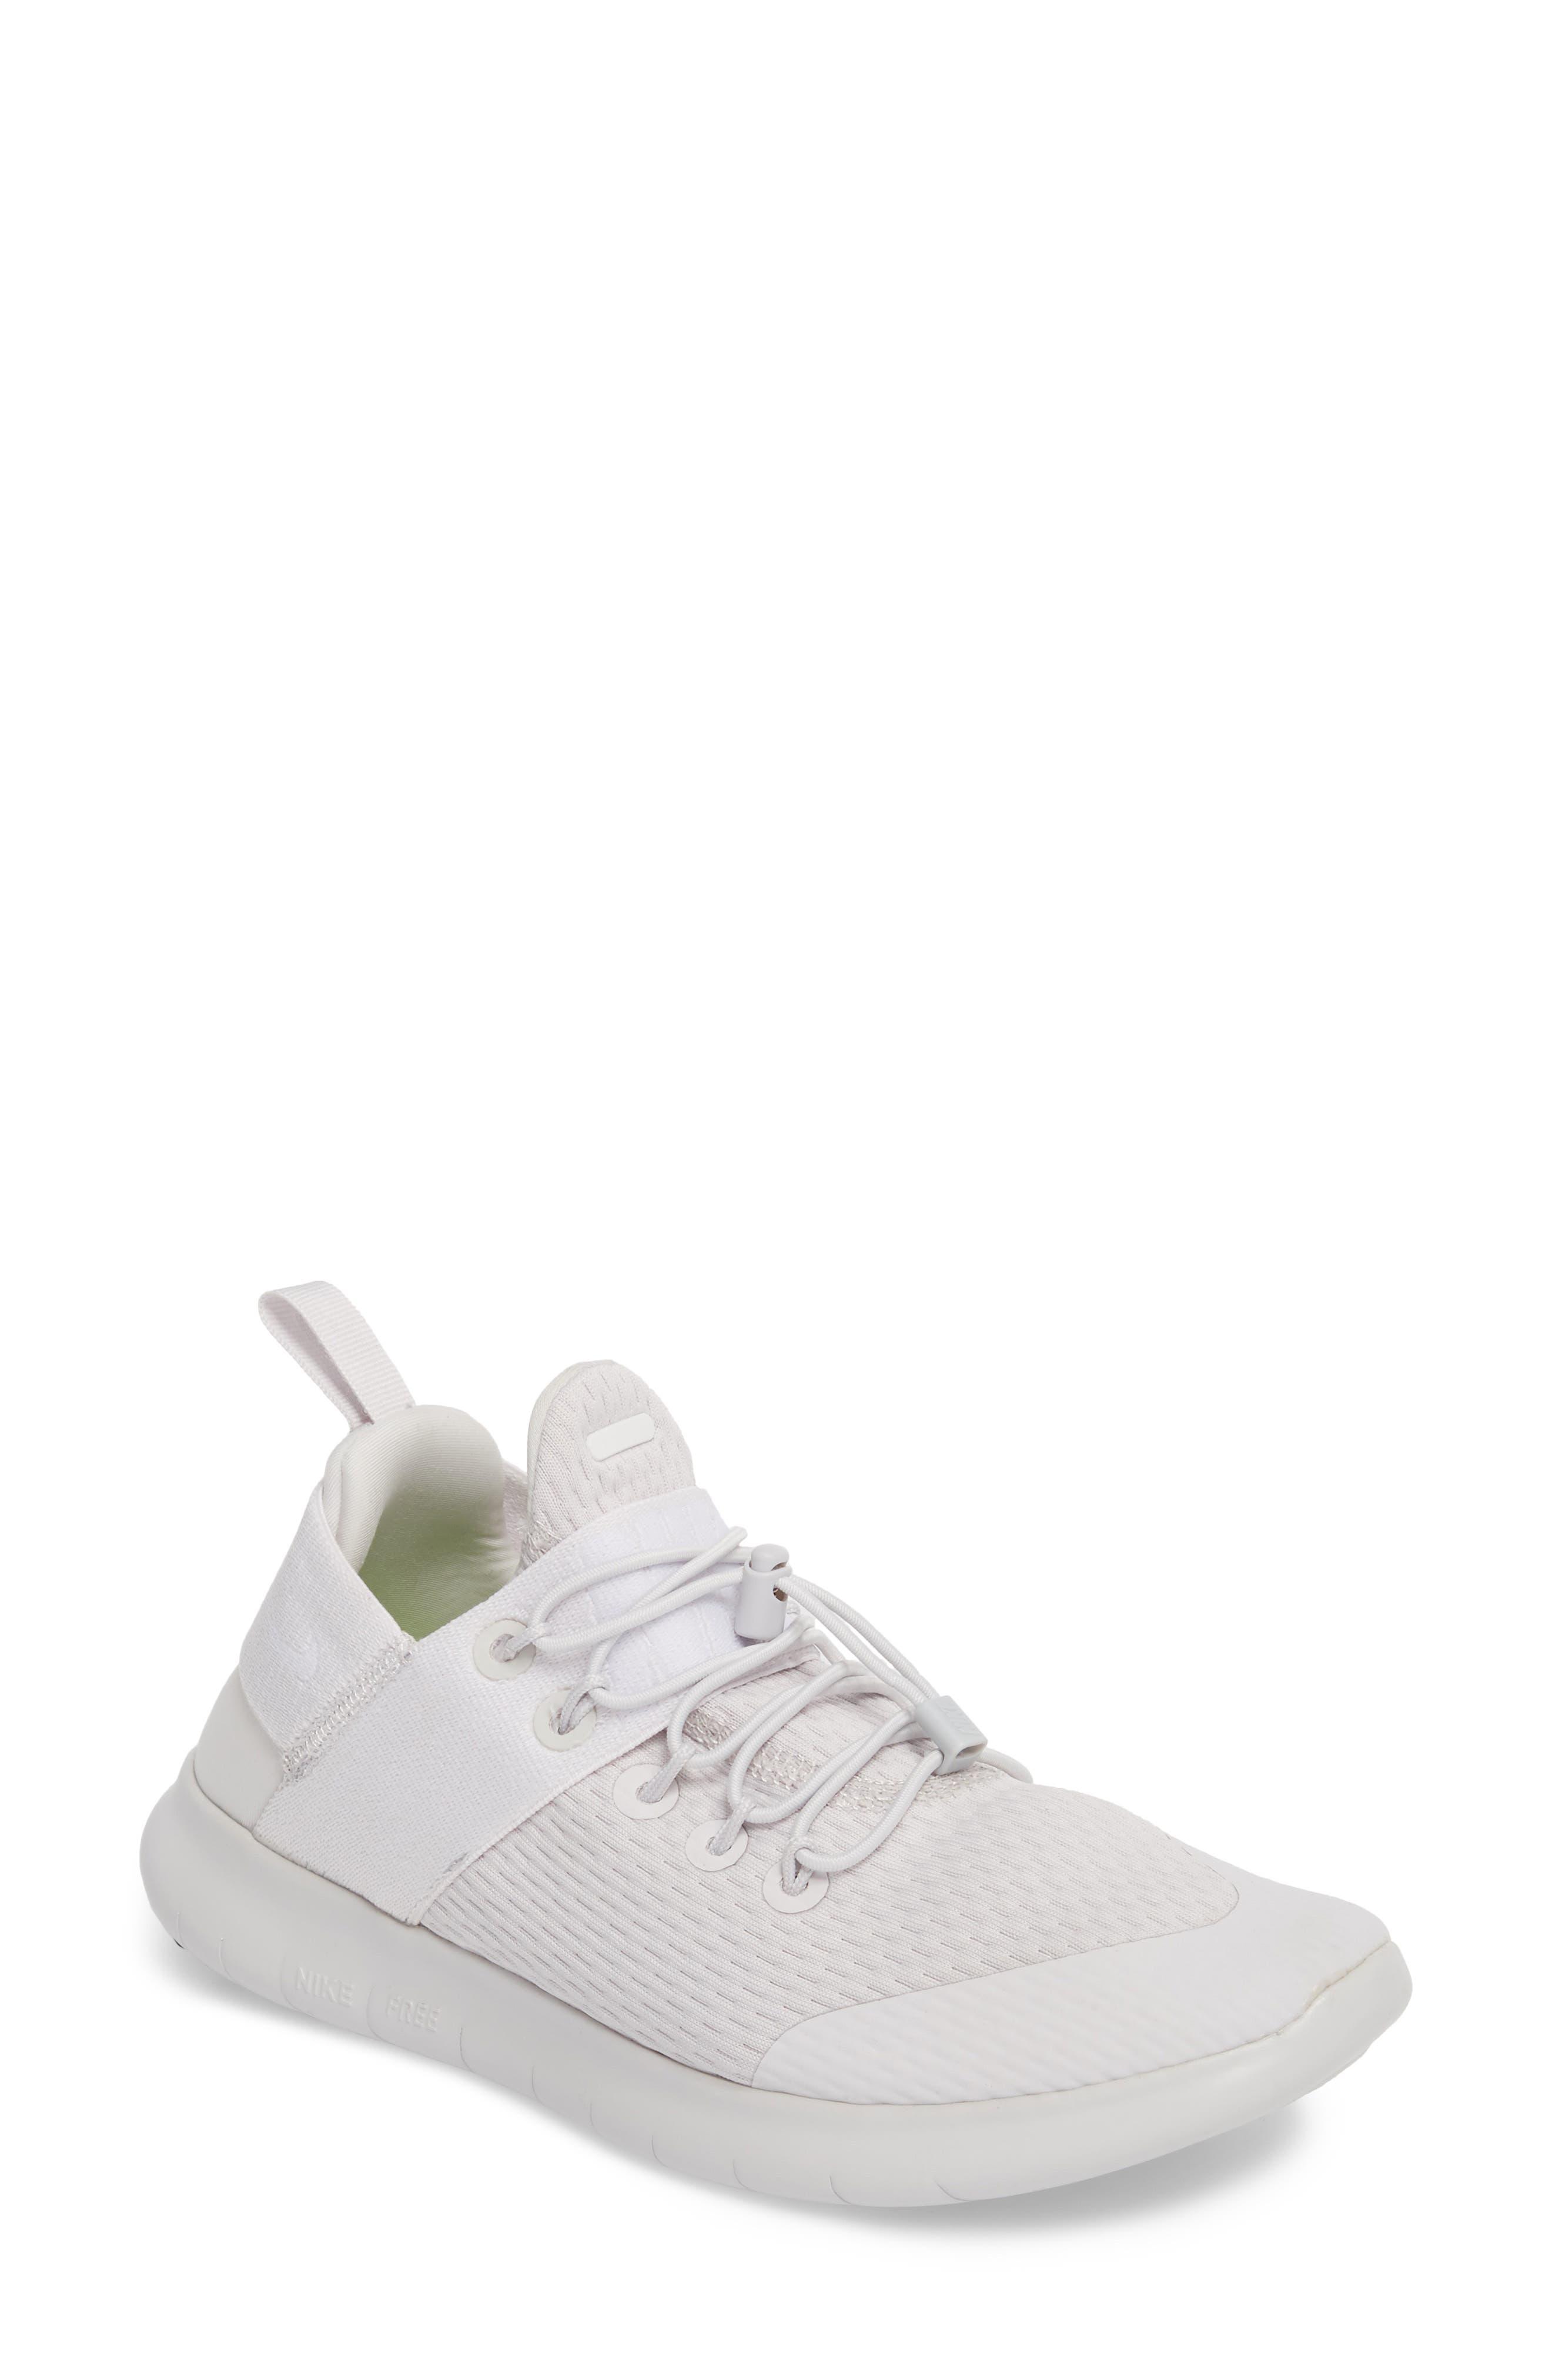 Main Image - Nike Free RN CMTR Running Shoe (Women)